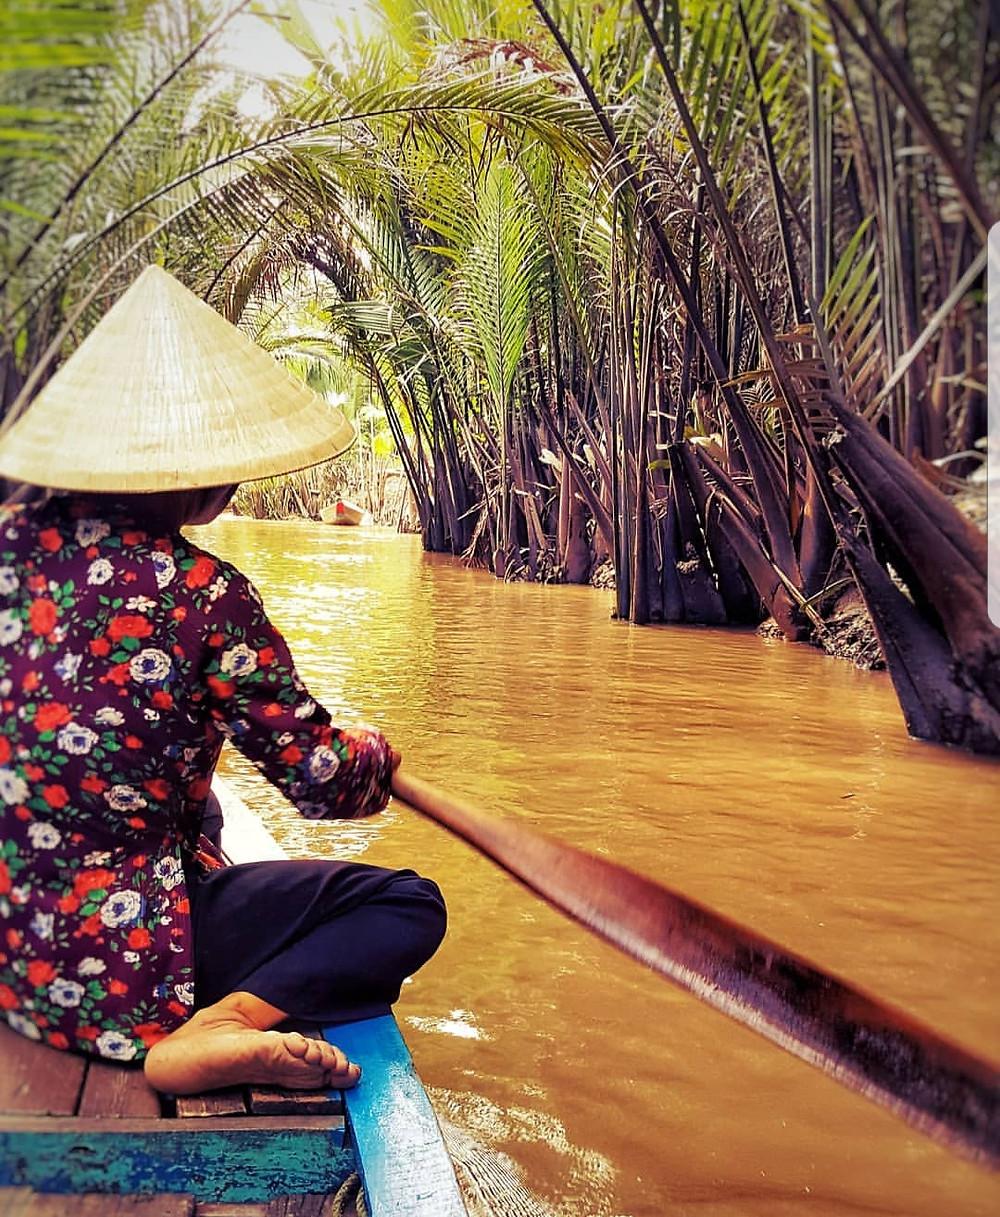 Boat Tour in the Mekong Delta, Vietnam